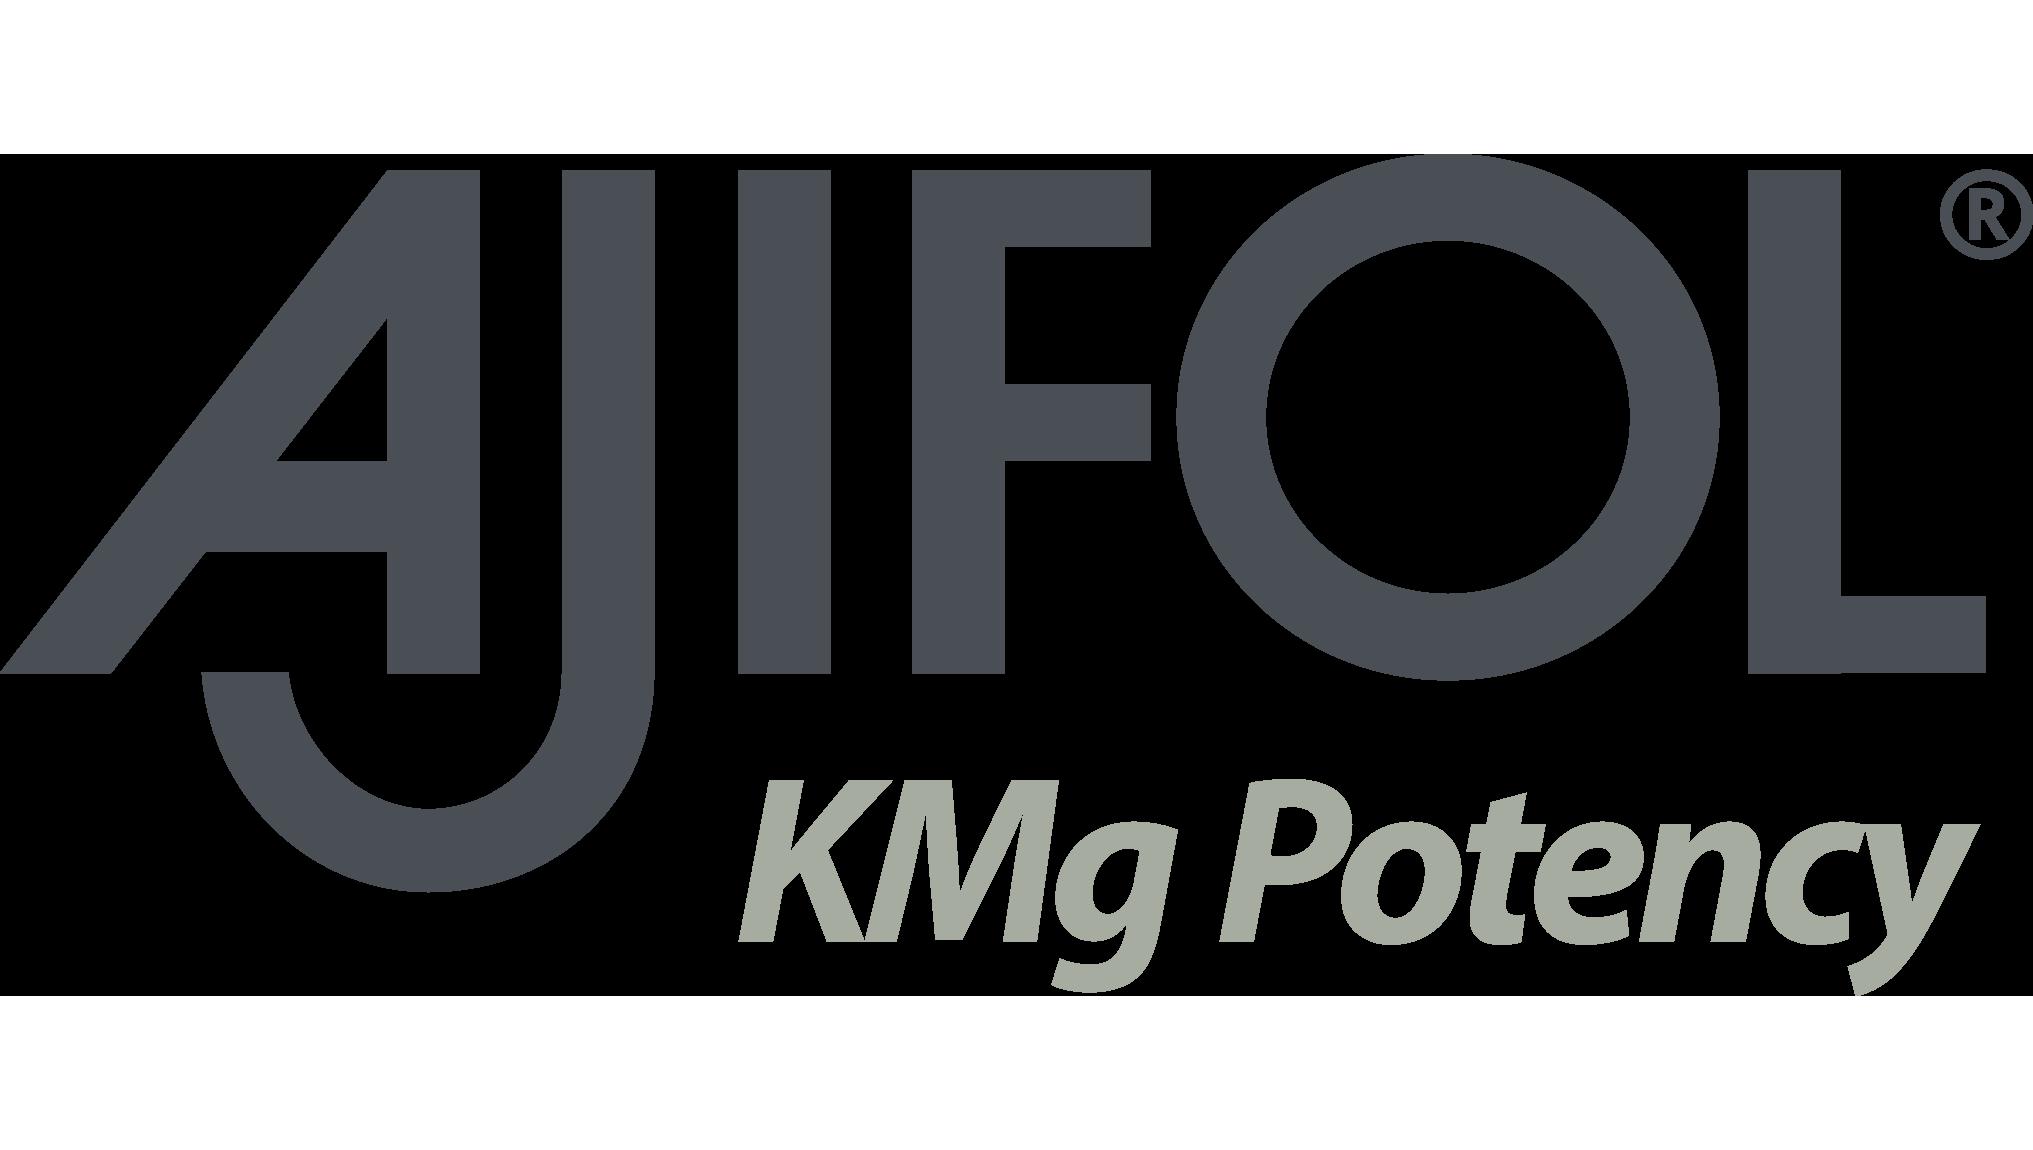 Fertilizante Ajifol KMg Potency